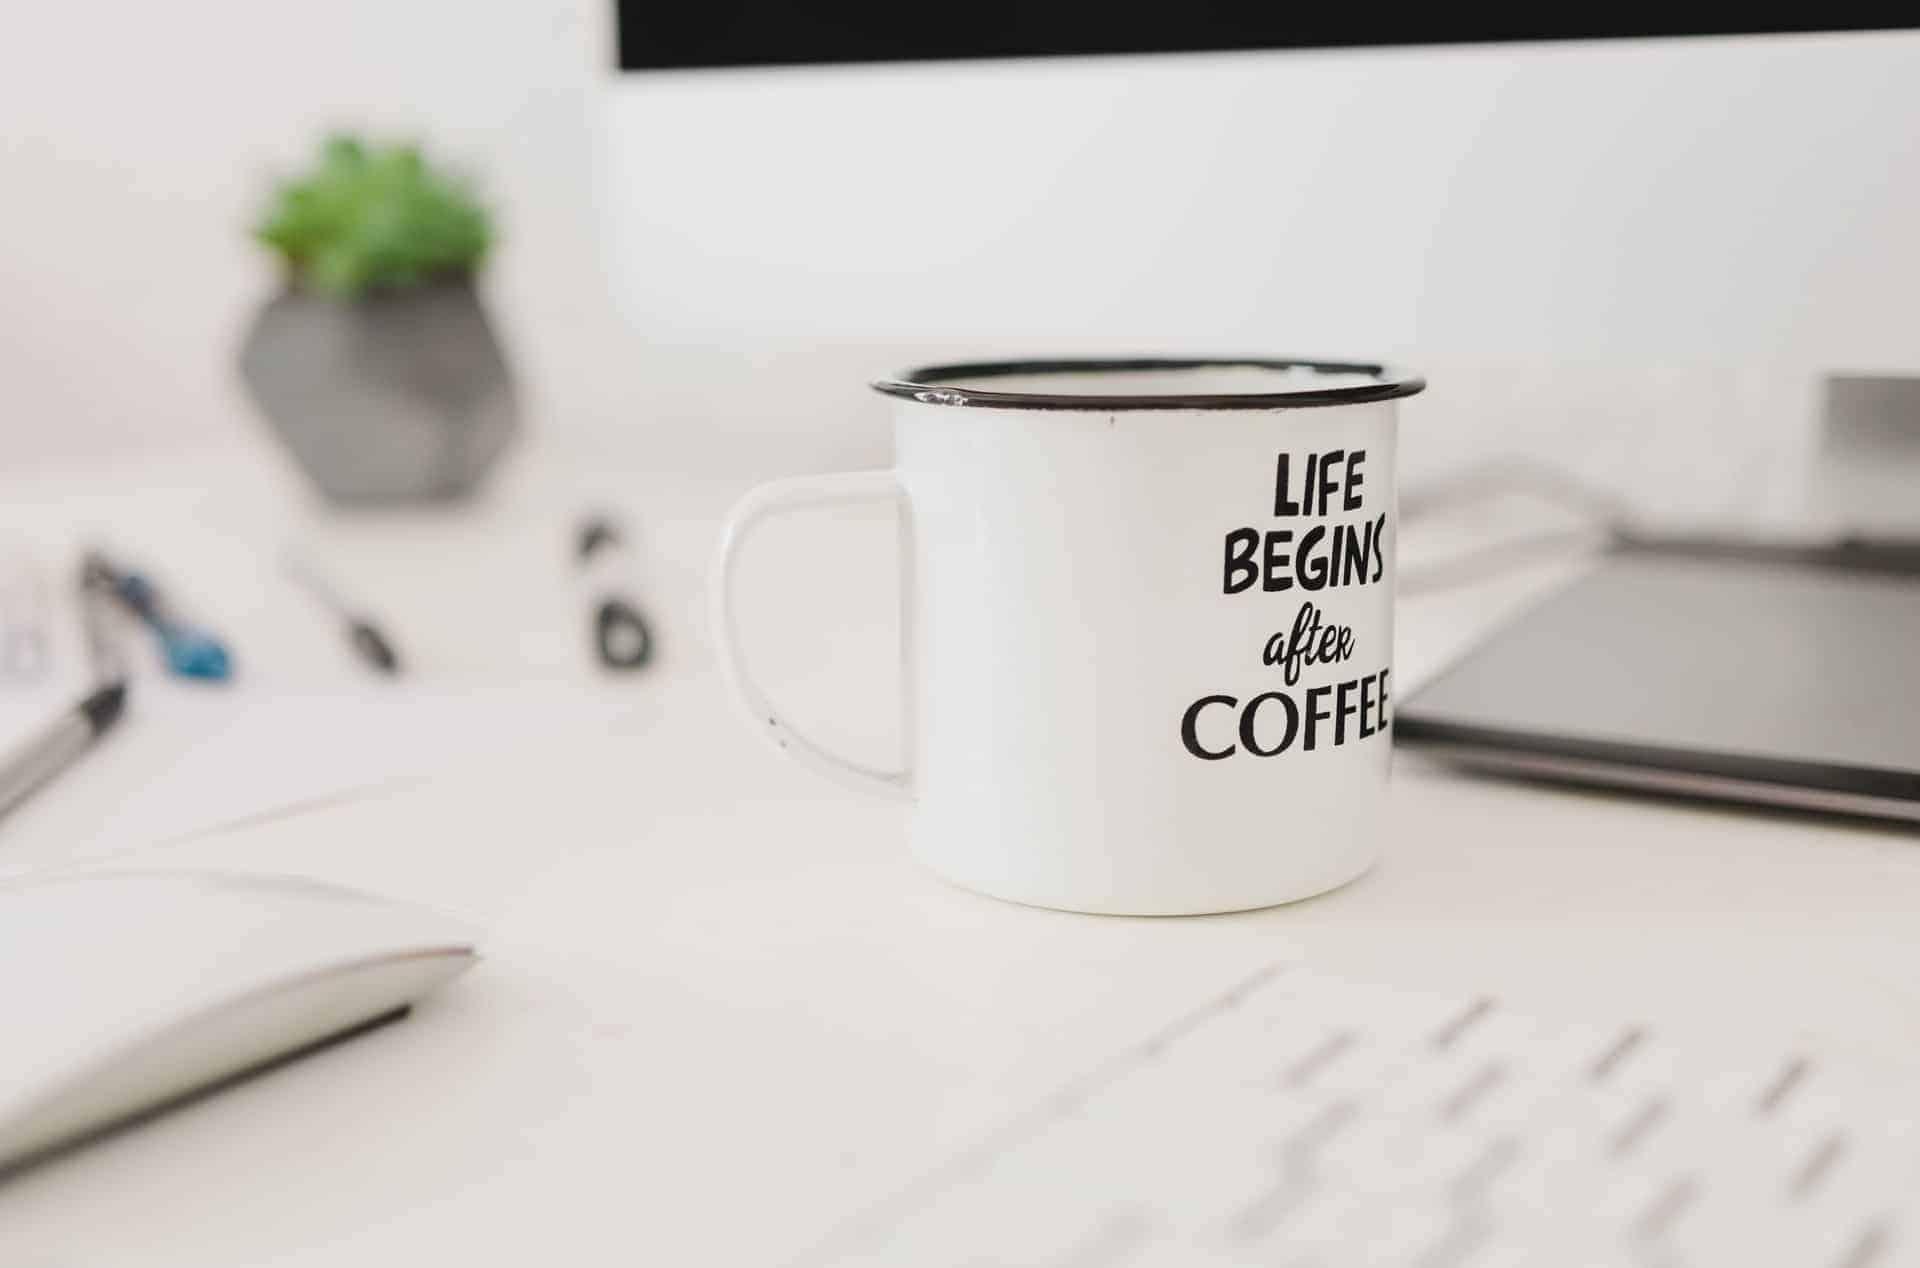 Šalica na uredskom stolu -Life begins after coffee